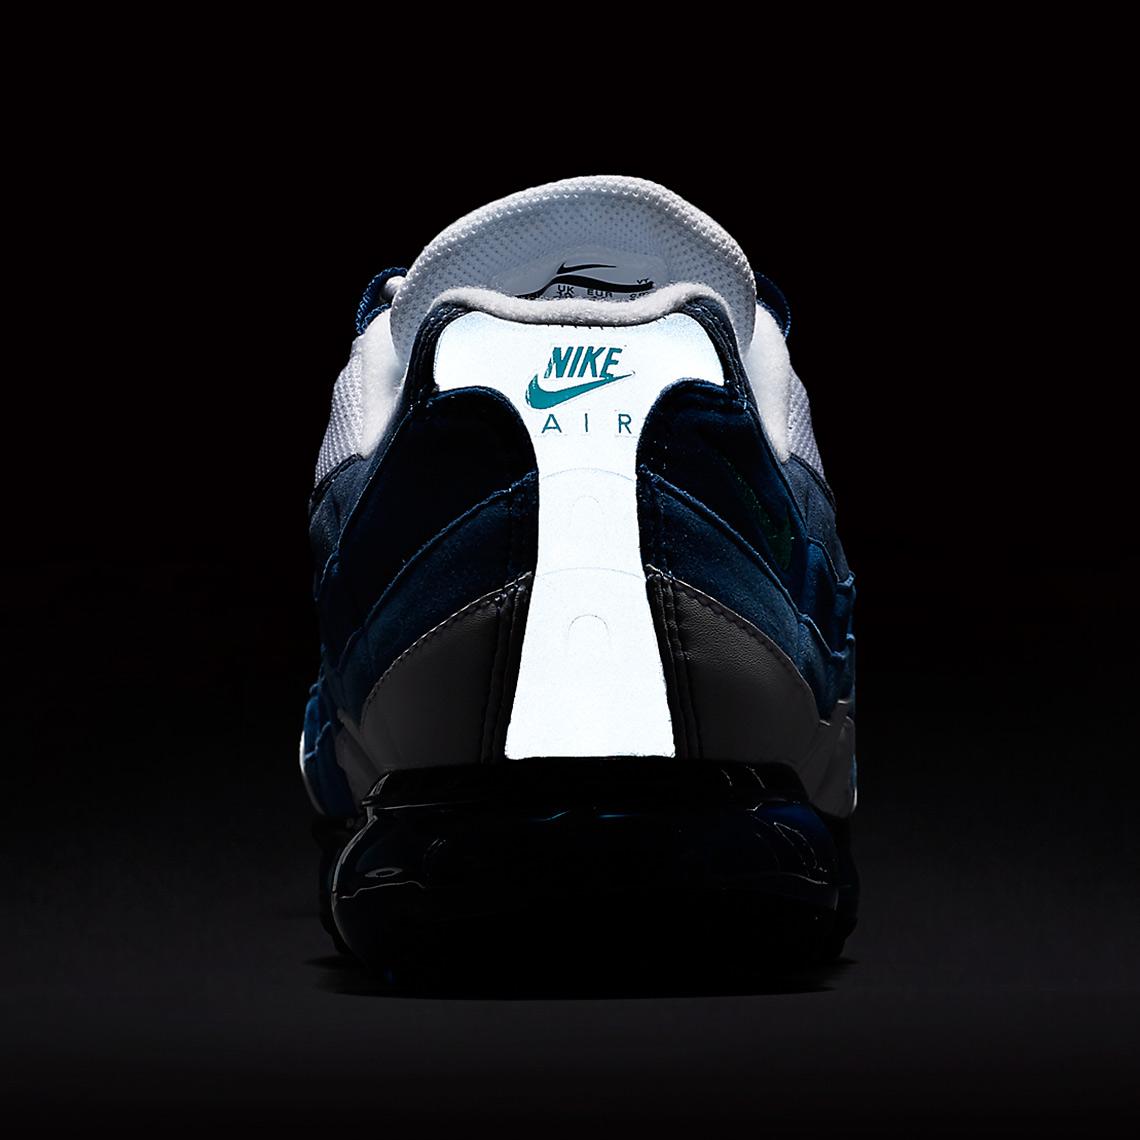 587d3cbb75c6 Nike Vapormax 95 Slate AJ7292-100 Release Date